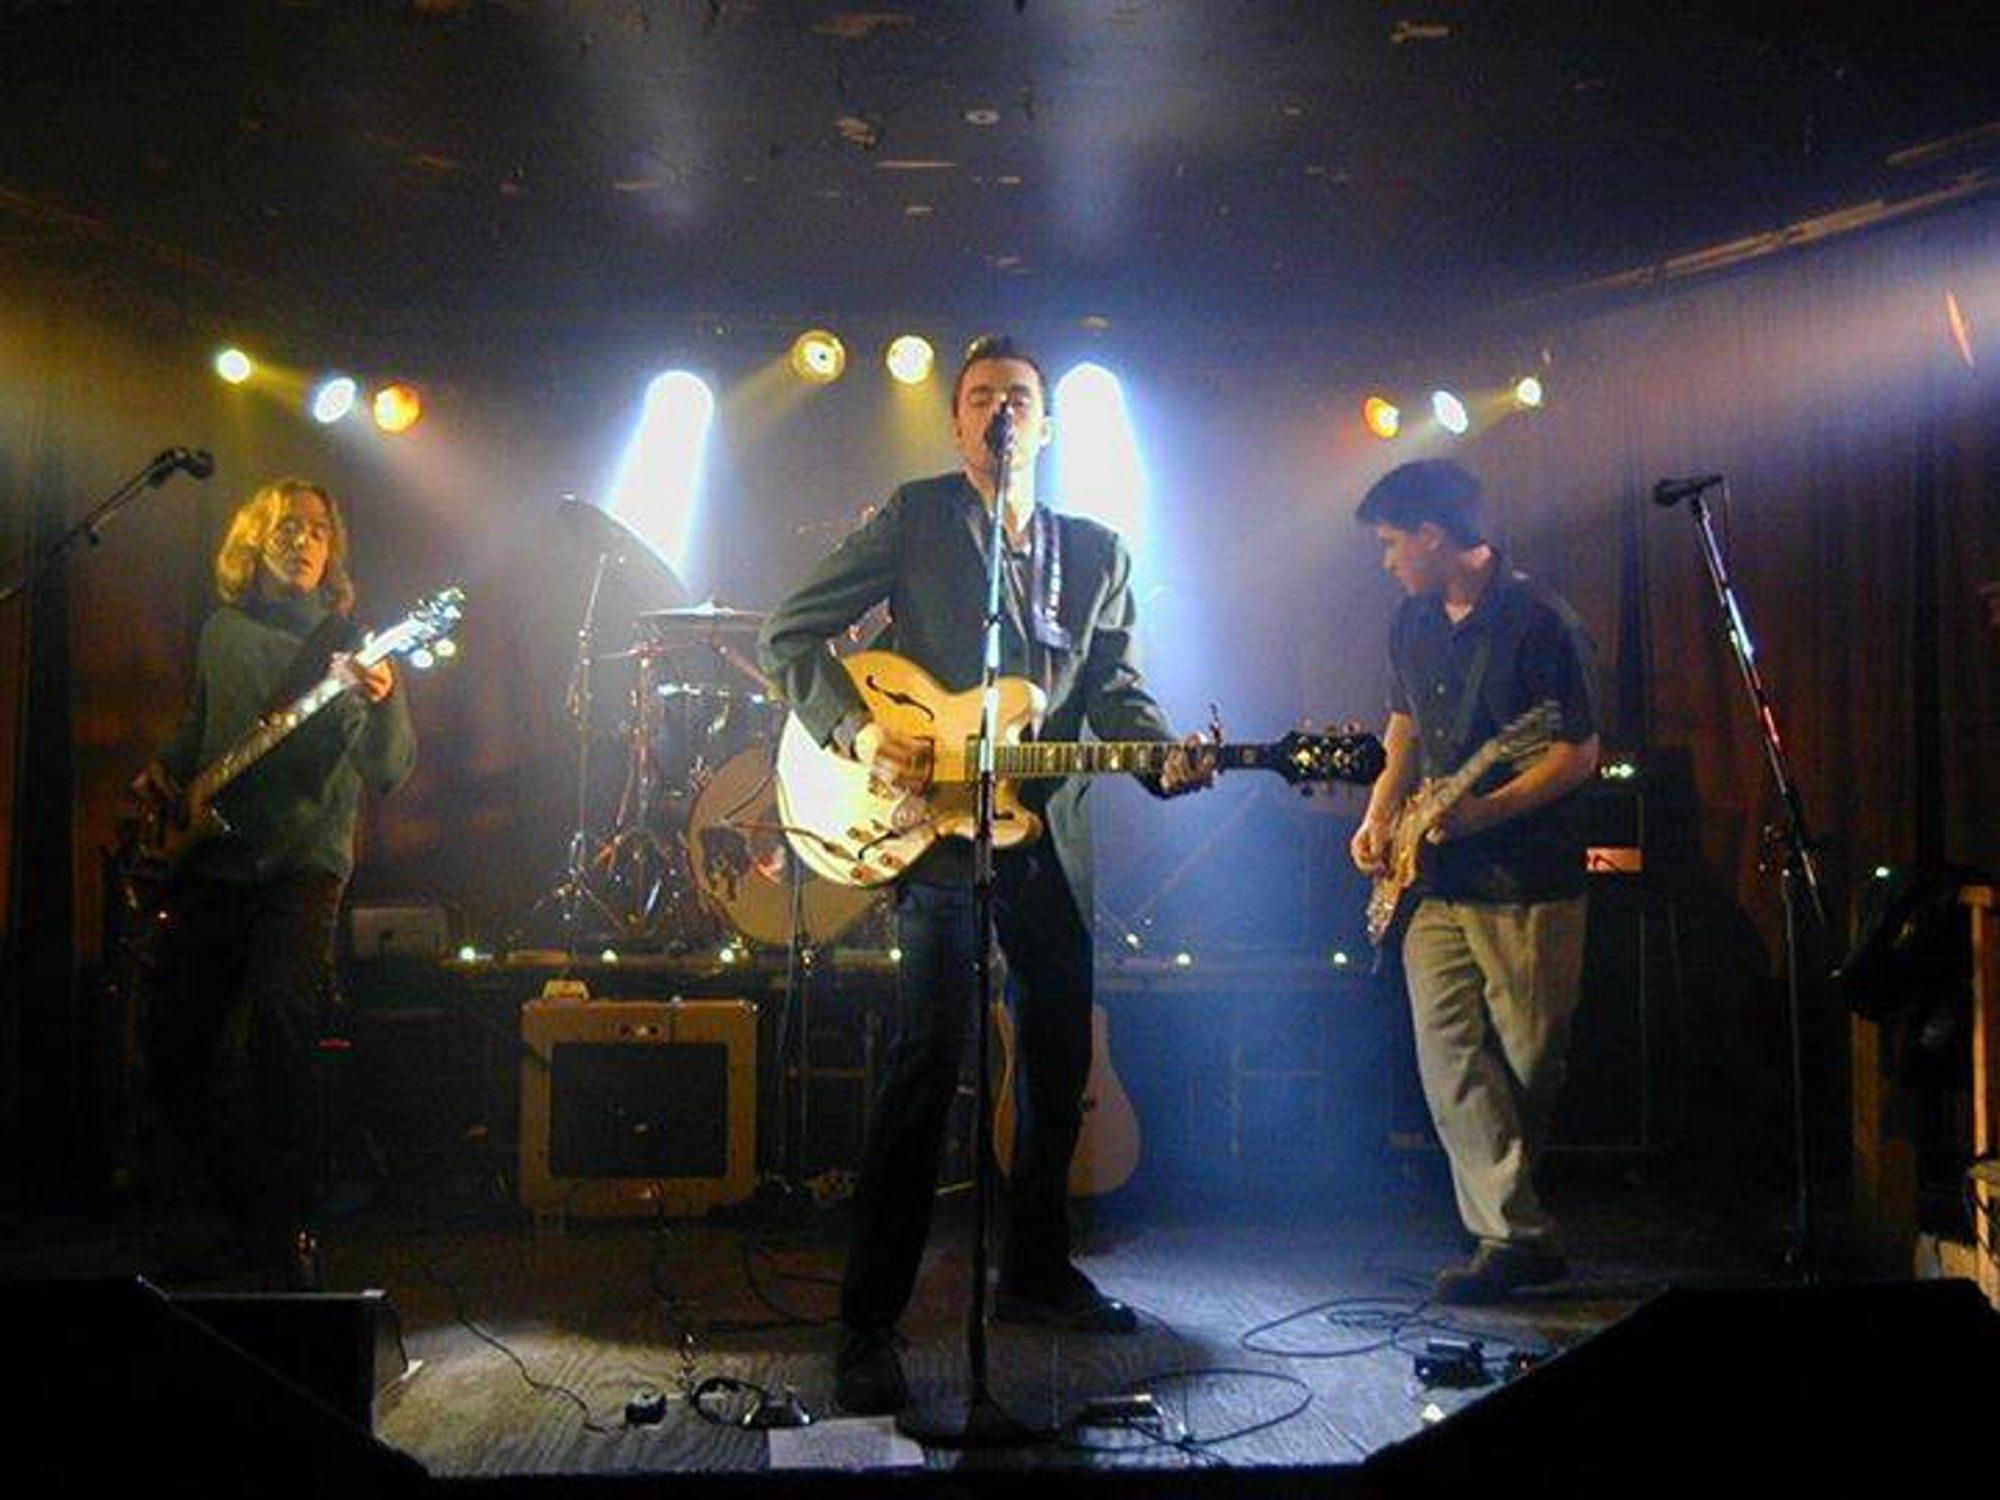 53 Days performs Jan. 15 in the Sportsmen's Tavern.